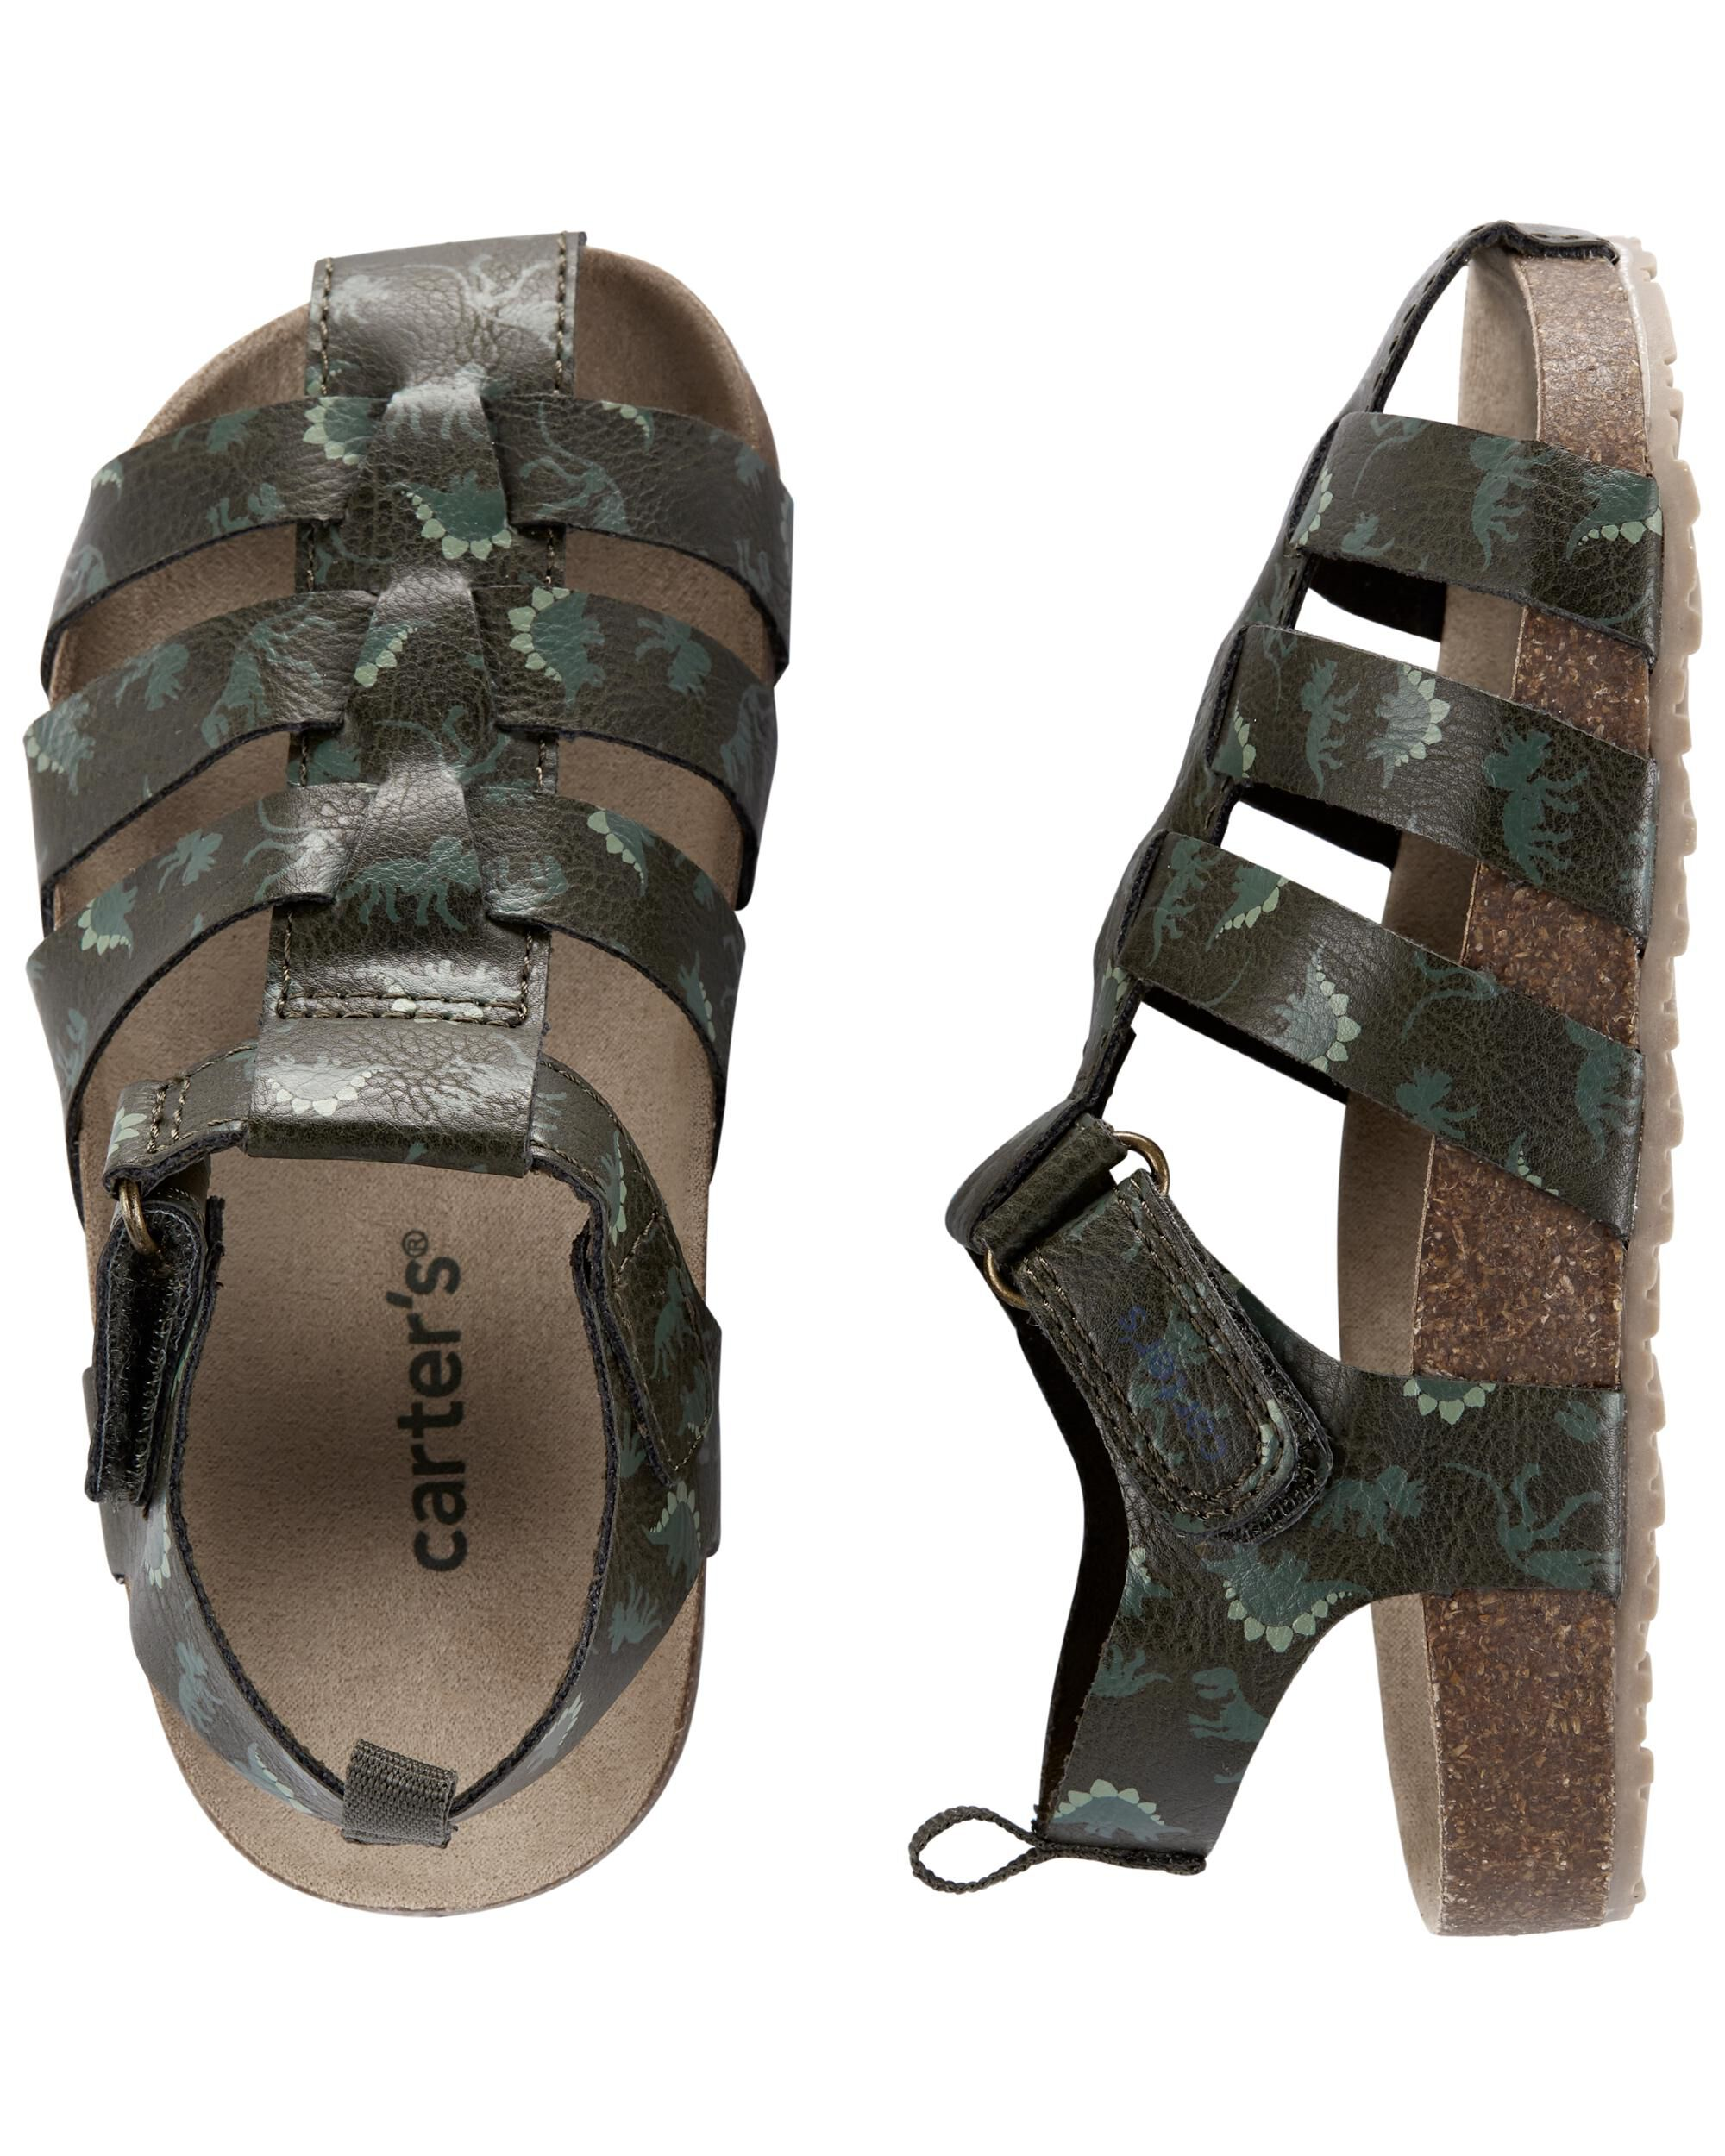 Carters Fisherman Sandals